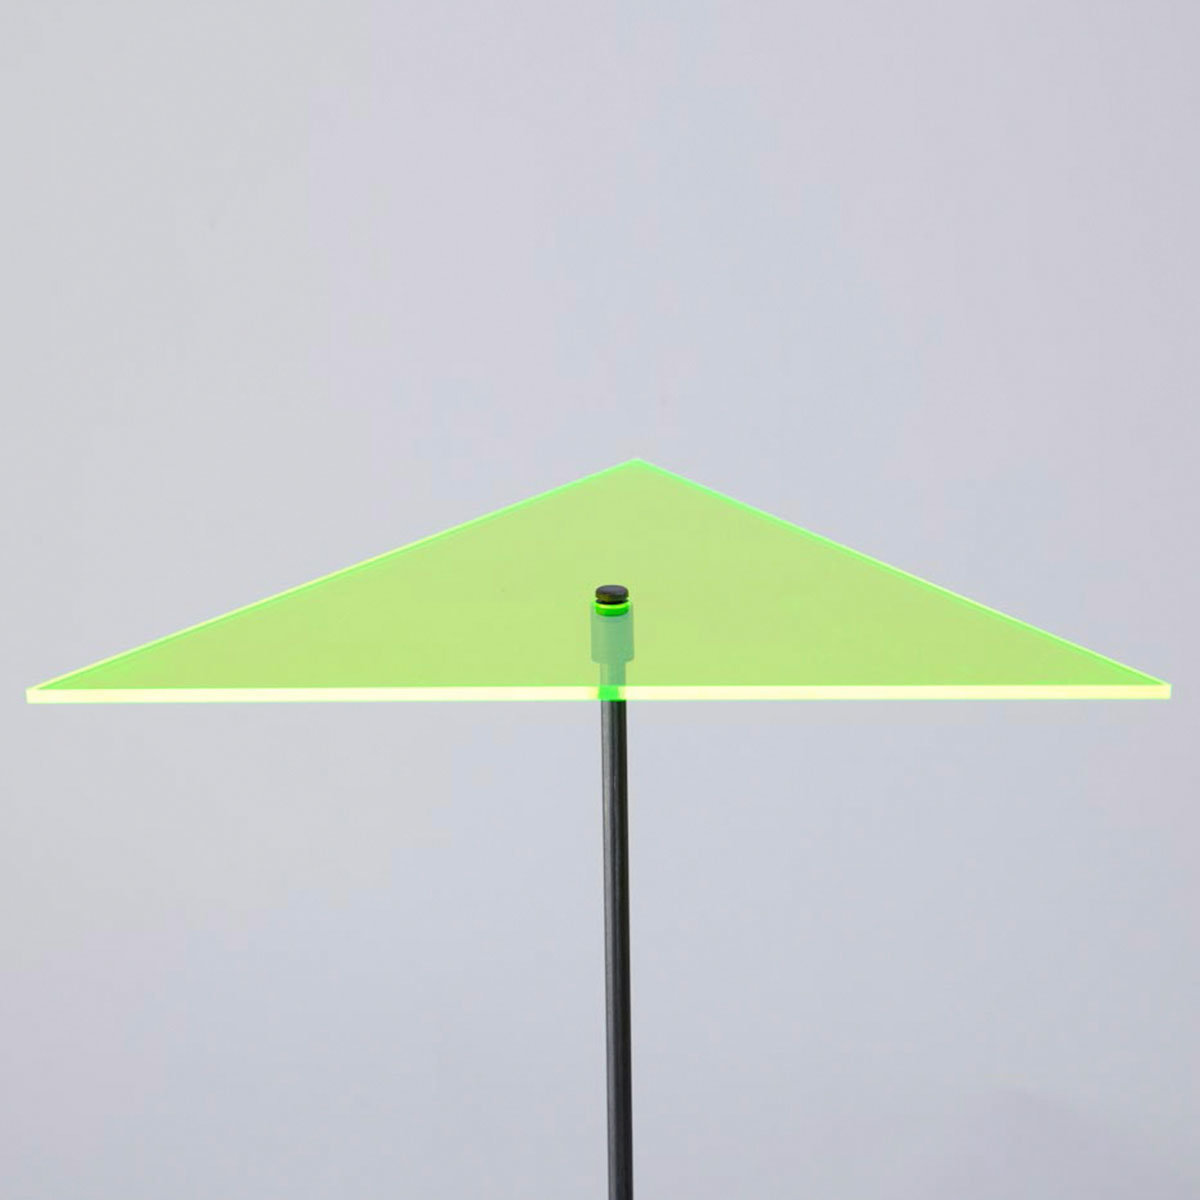 sunart® Acrylglas Lichtfänger, Dreieck, grün   #3